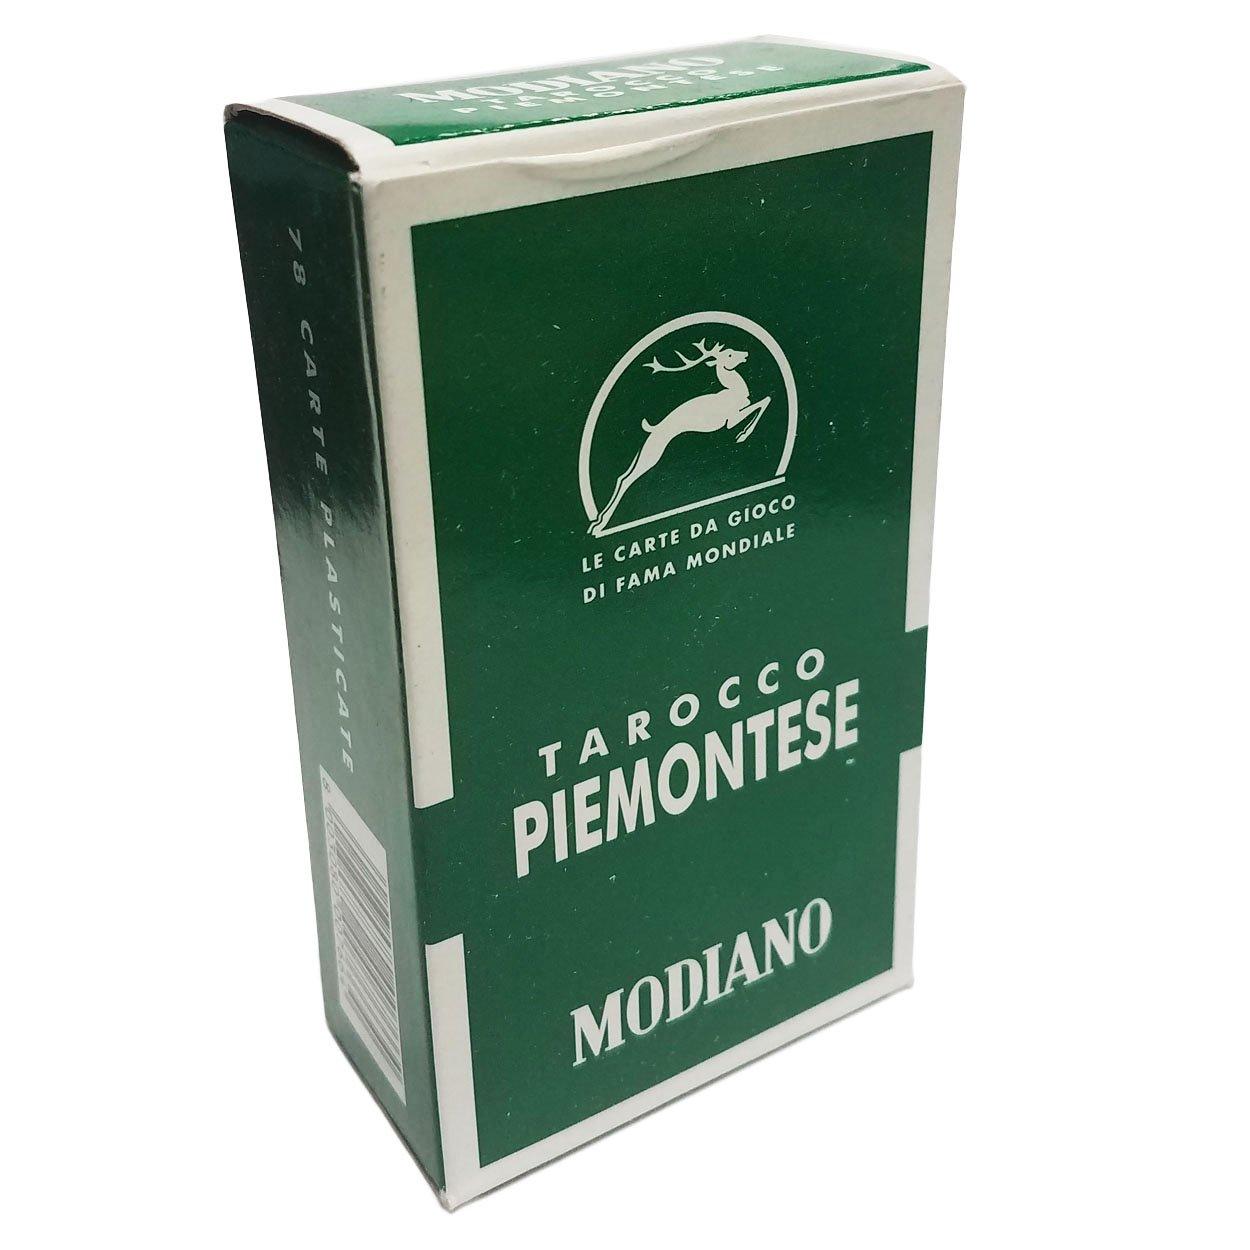 Tarocco Piemontese 84 Verde Green Italian Tarot Deck 78 Cards Piedmont